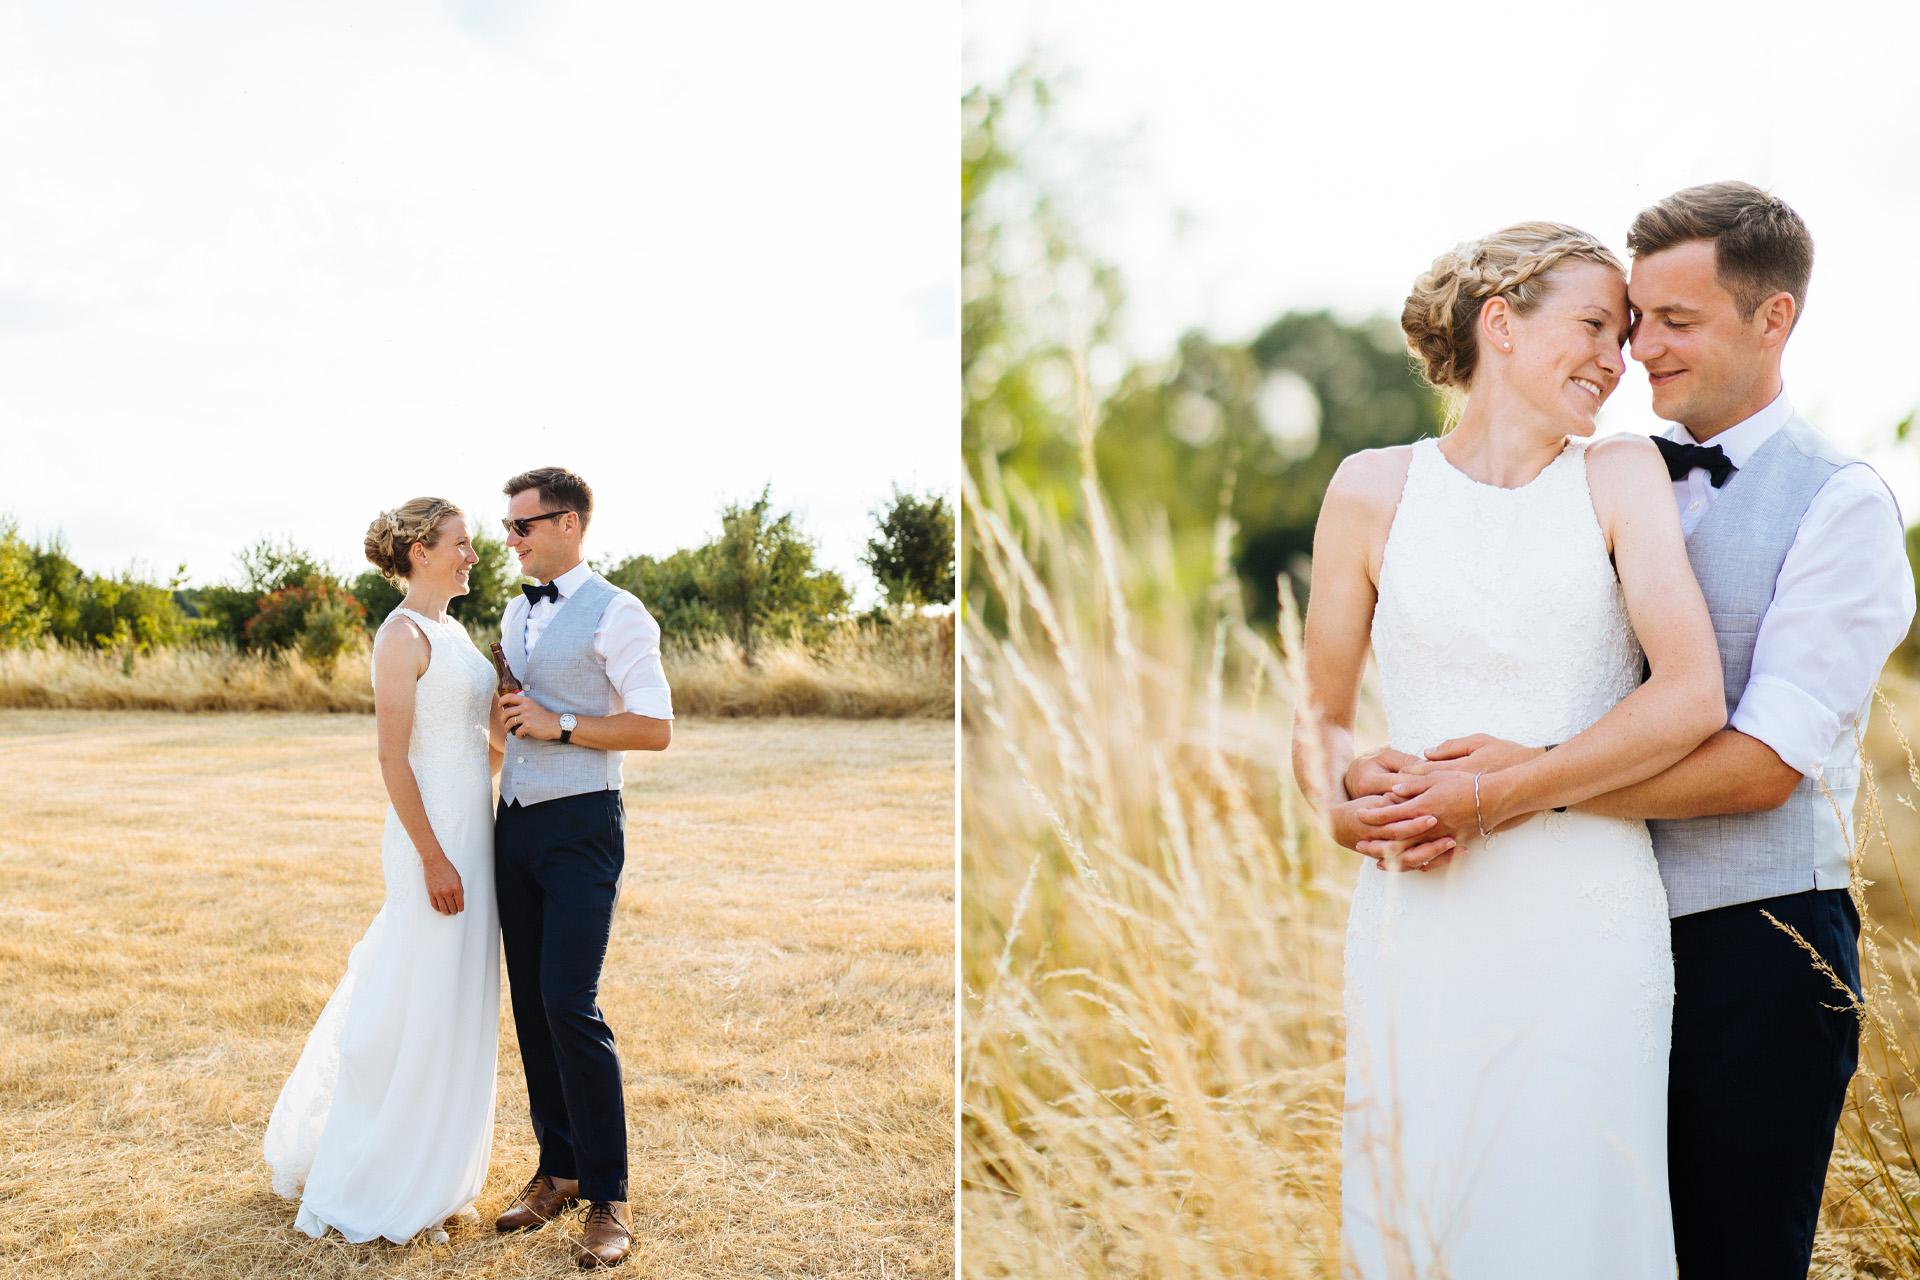 bride and groom cuddling in corn field at sunset at kentfield farm wedding